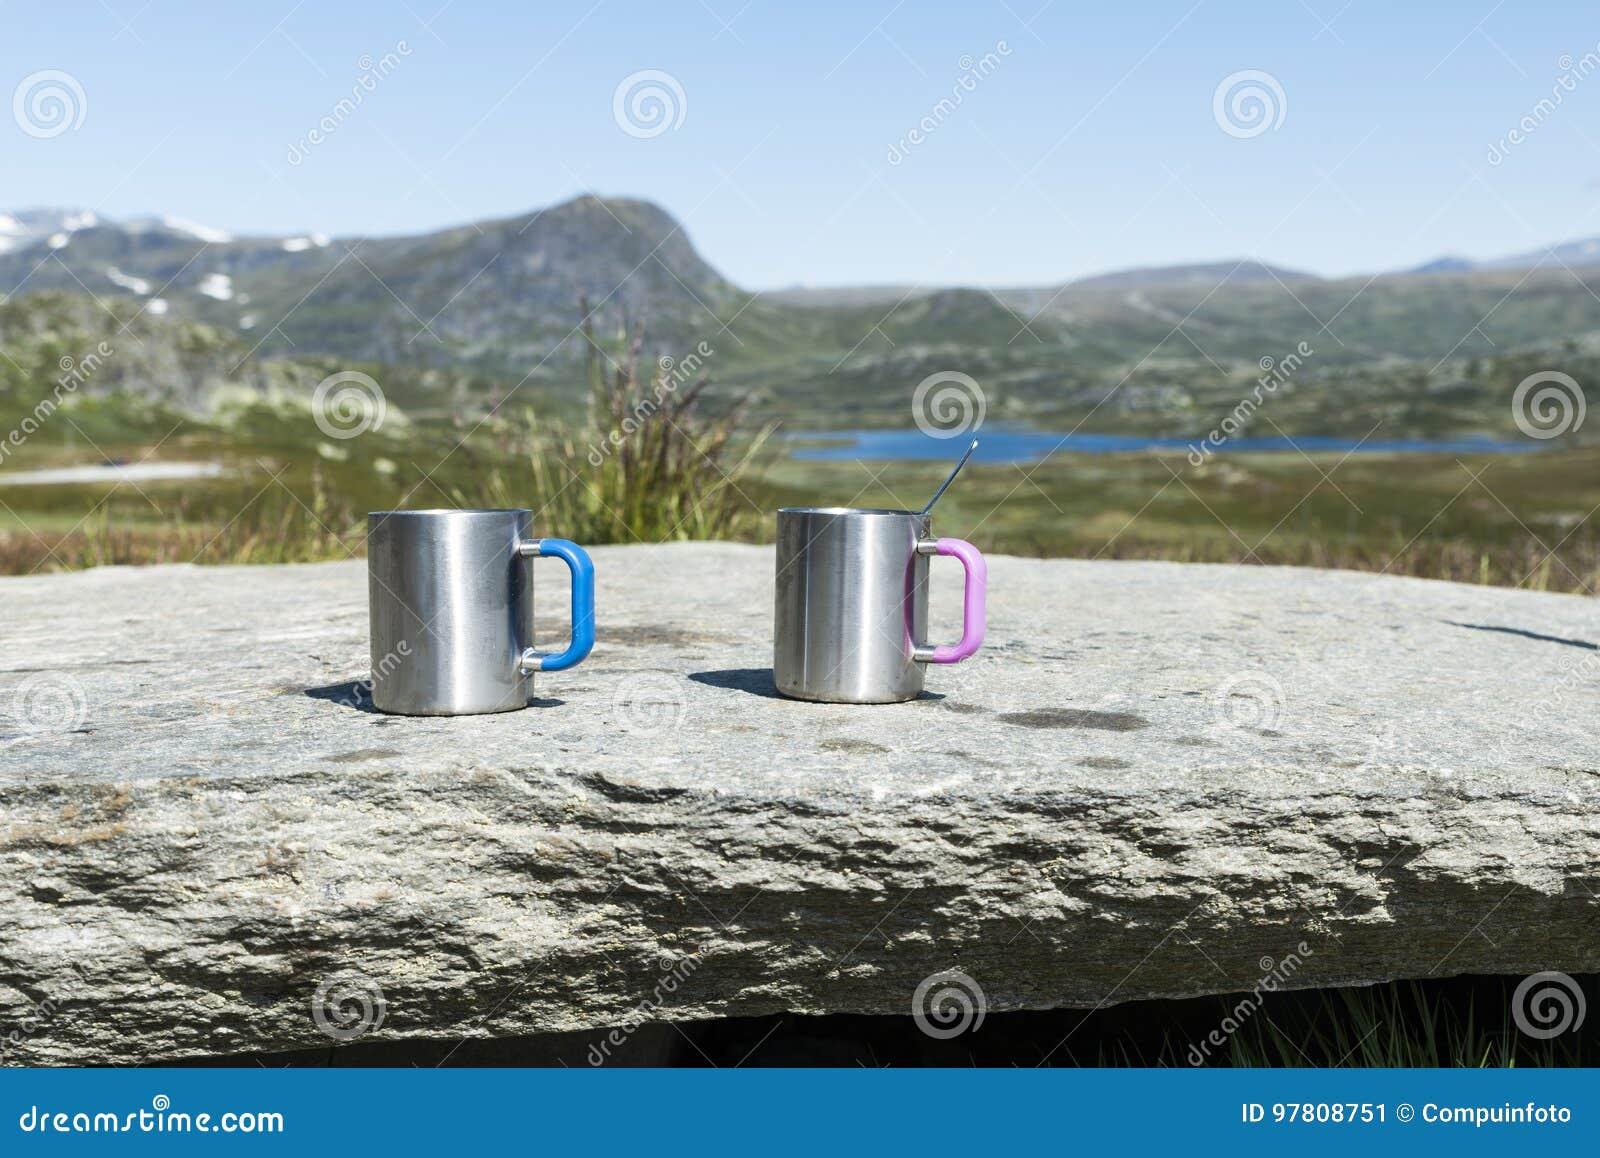 Twee coffee cups on the rocks